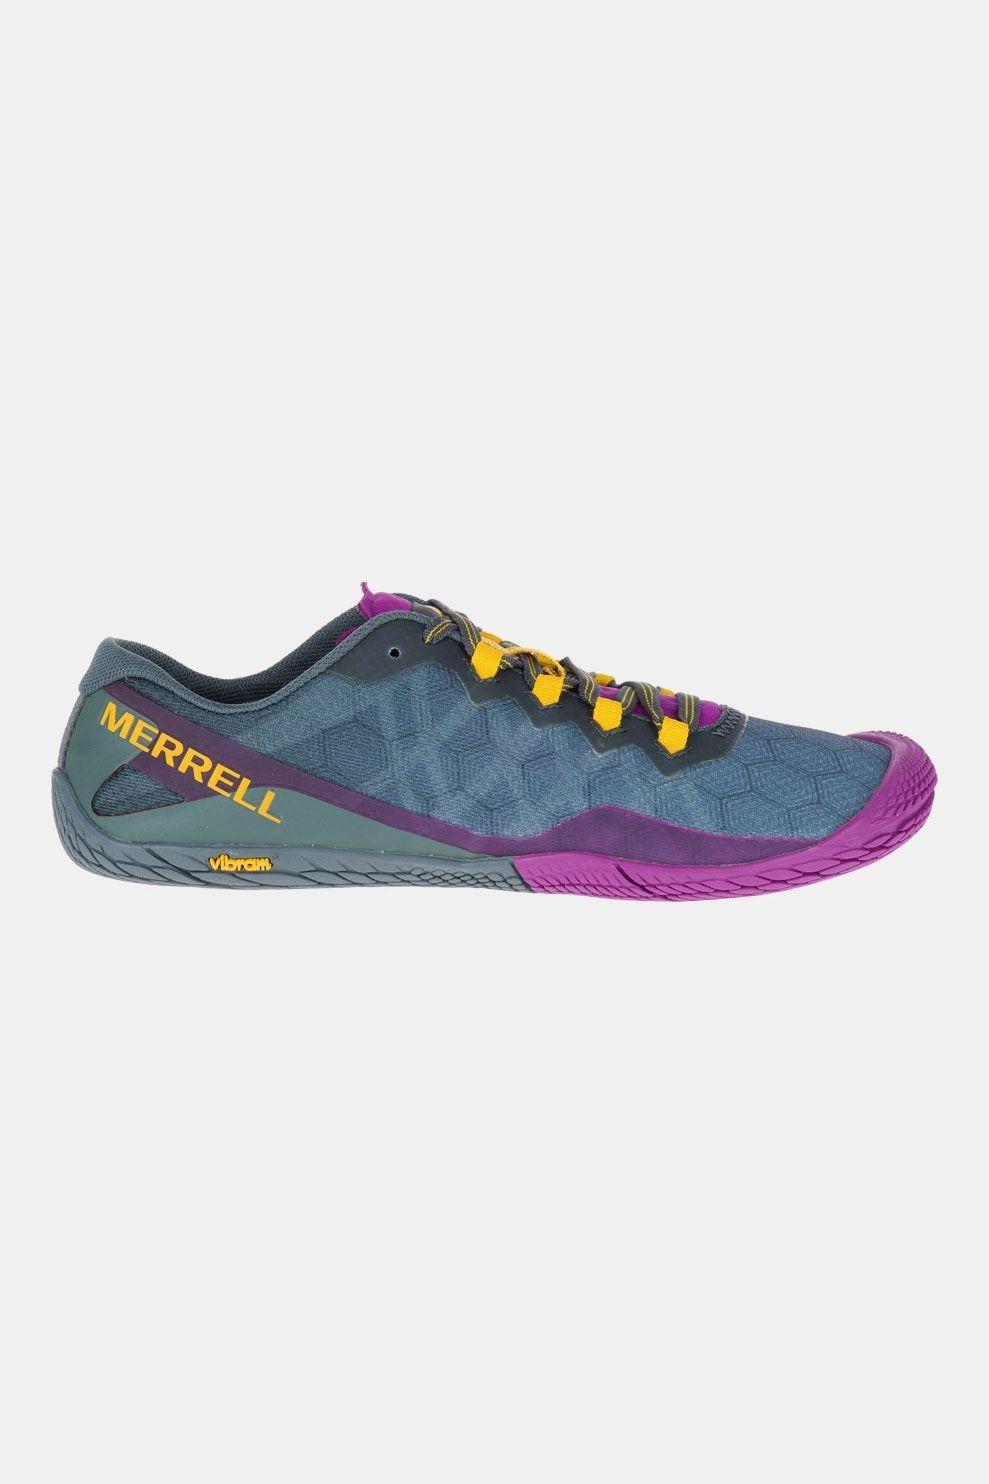 Merrell Vapor Glove 3 Barefoot Schoen Dames Blauw/Paars